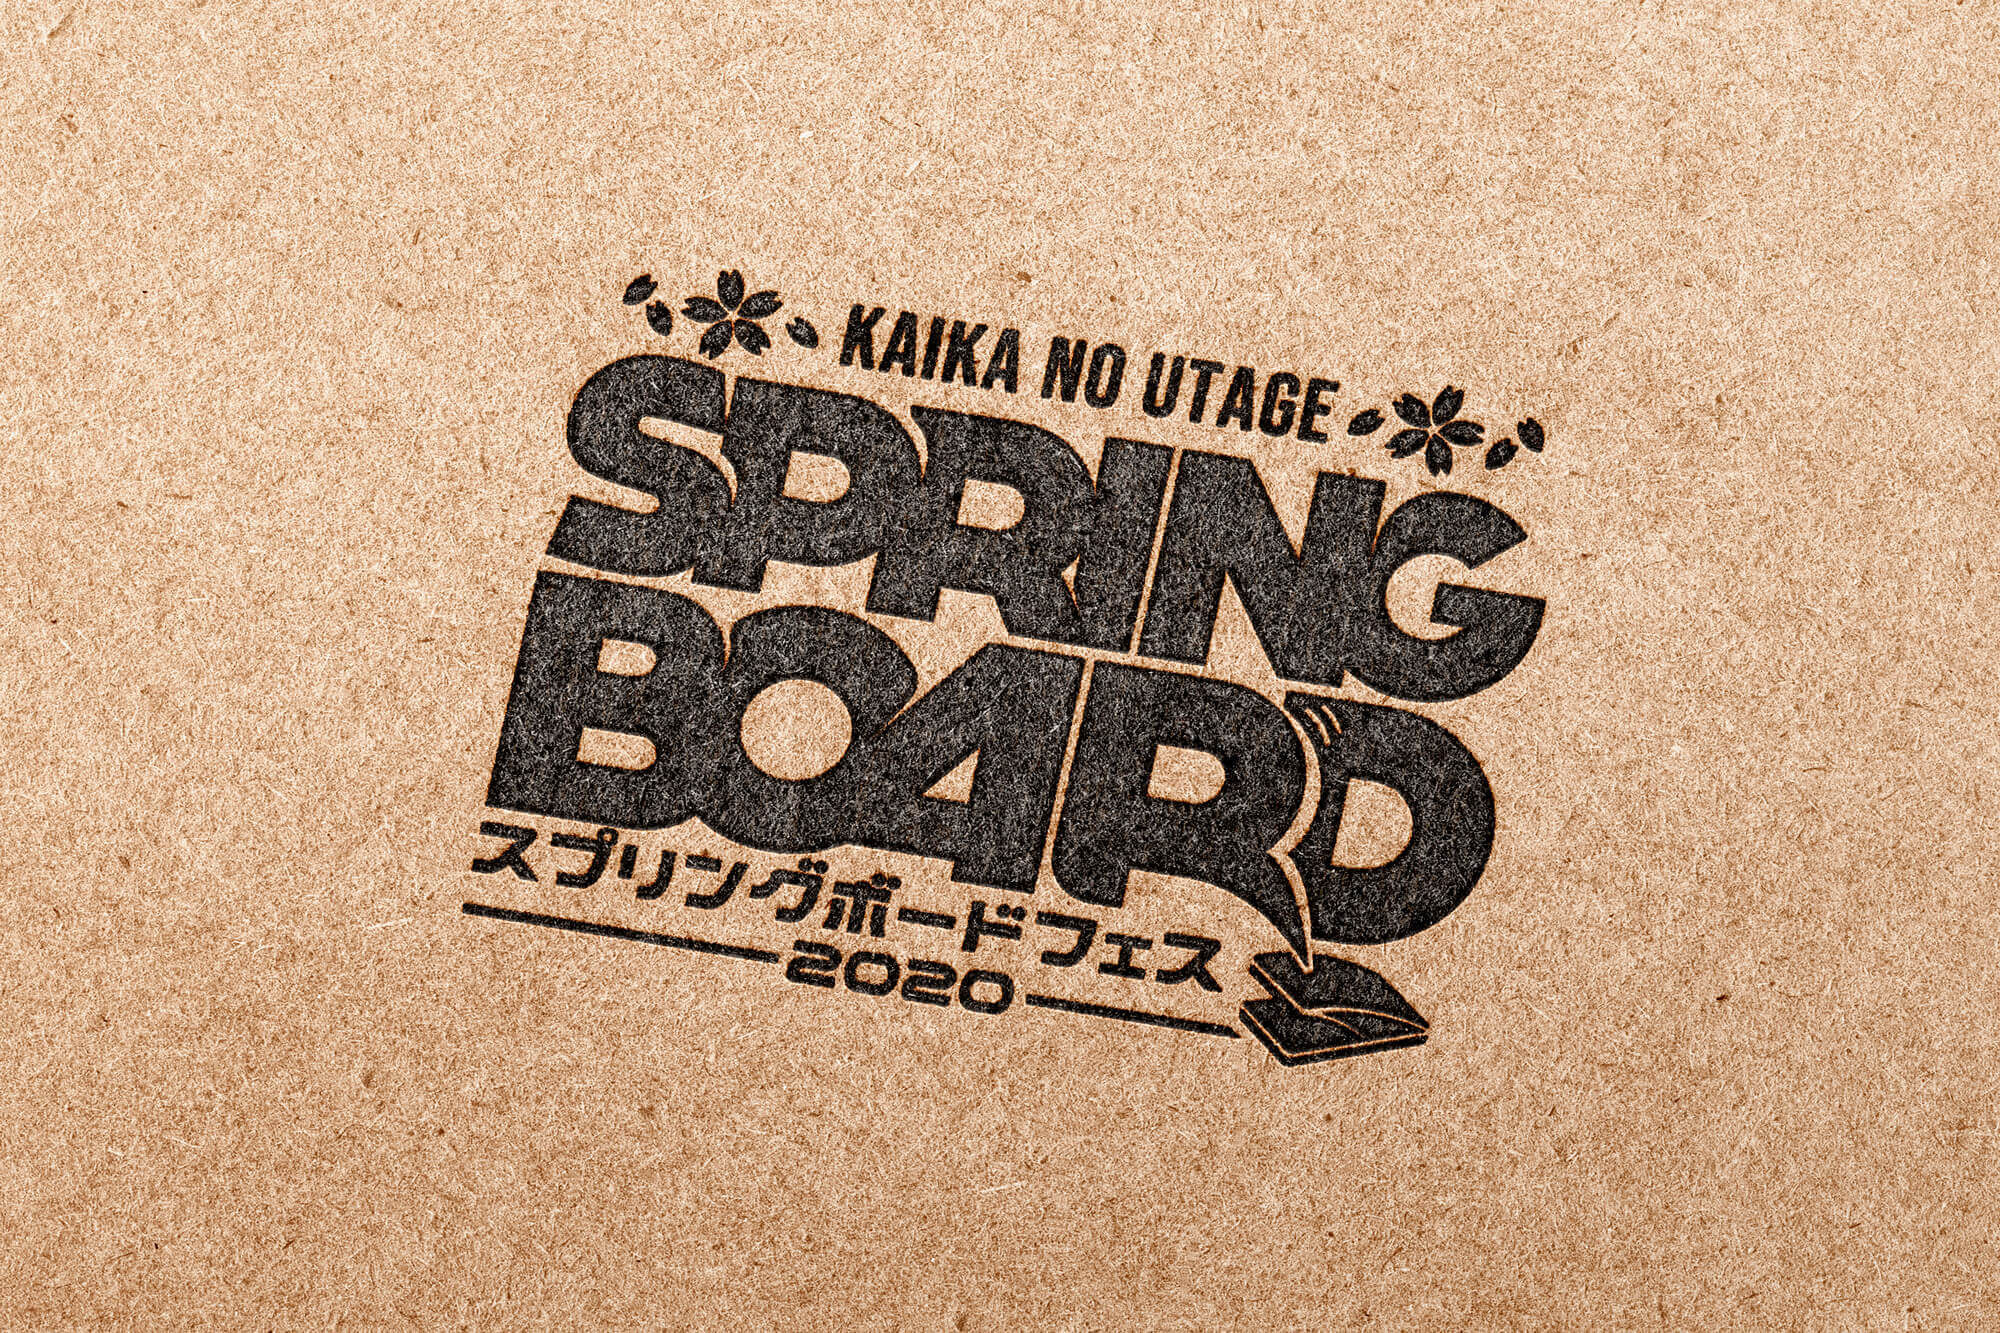 KAIKA NO UTAGE SPRING BOARD FES'2020のロゴ